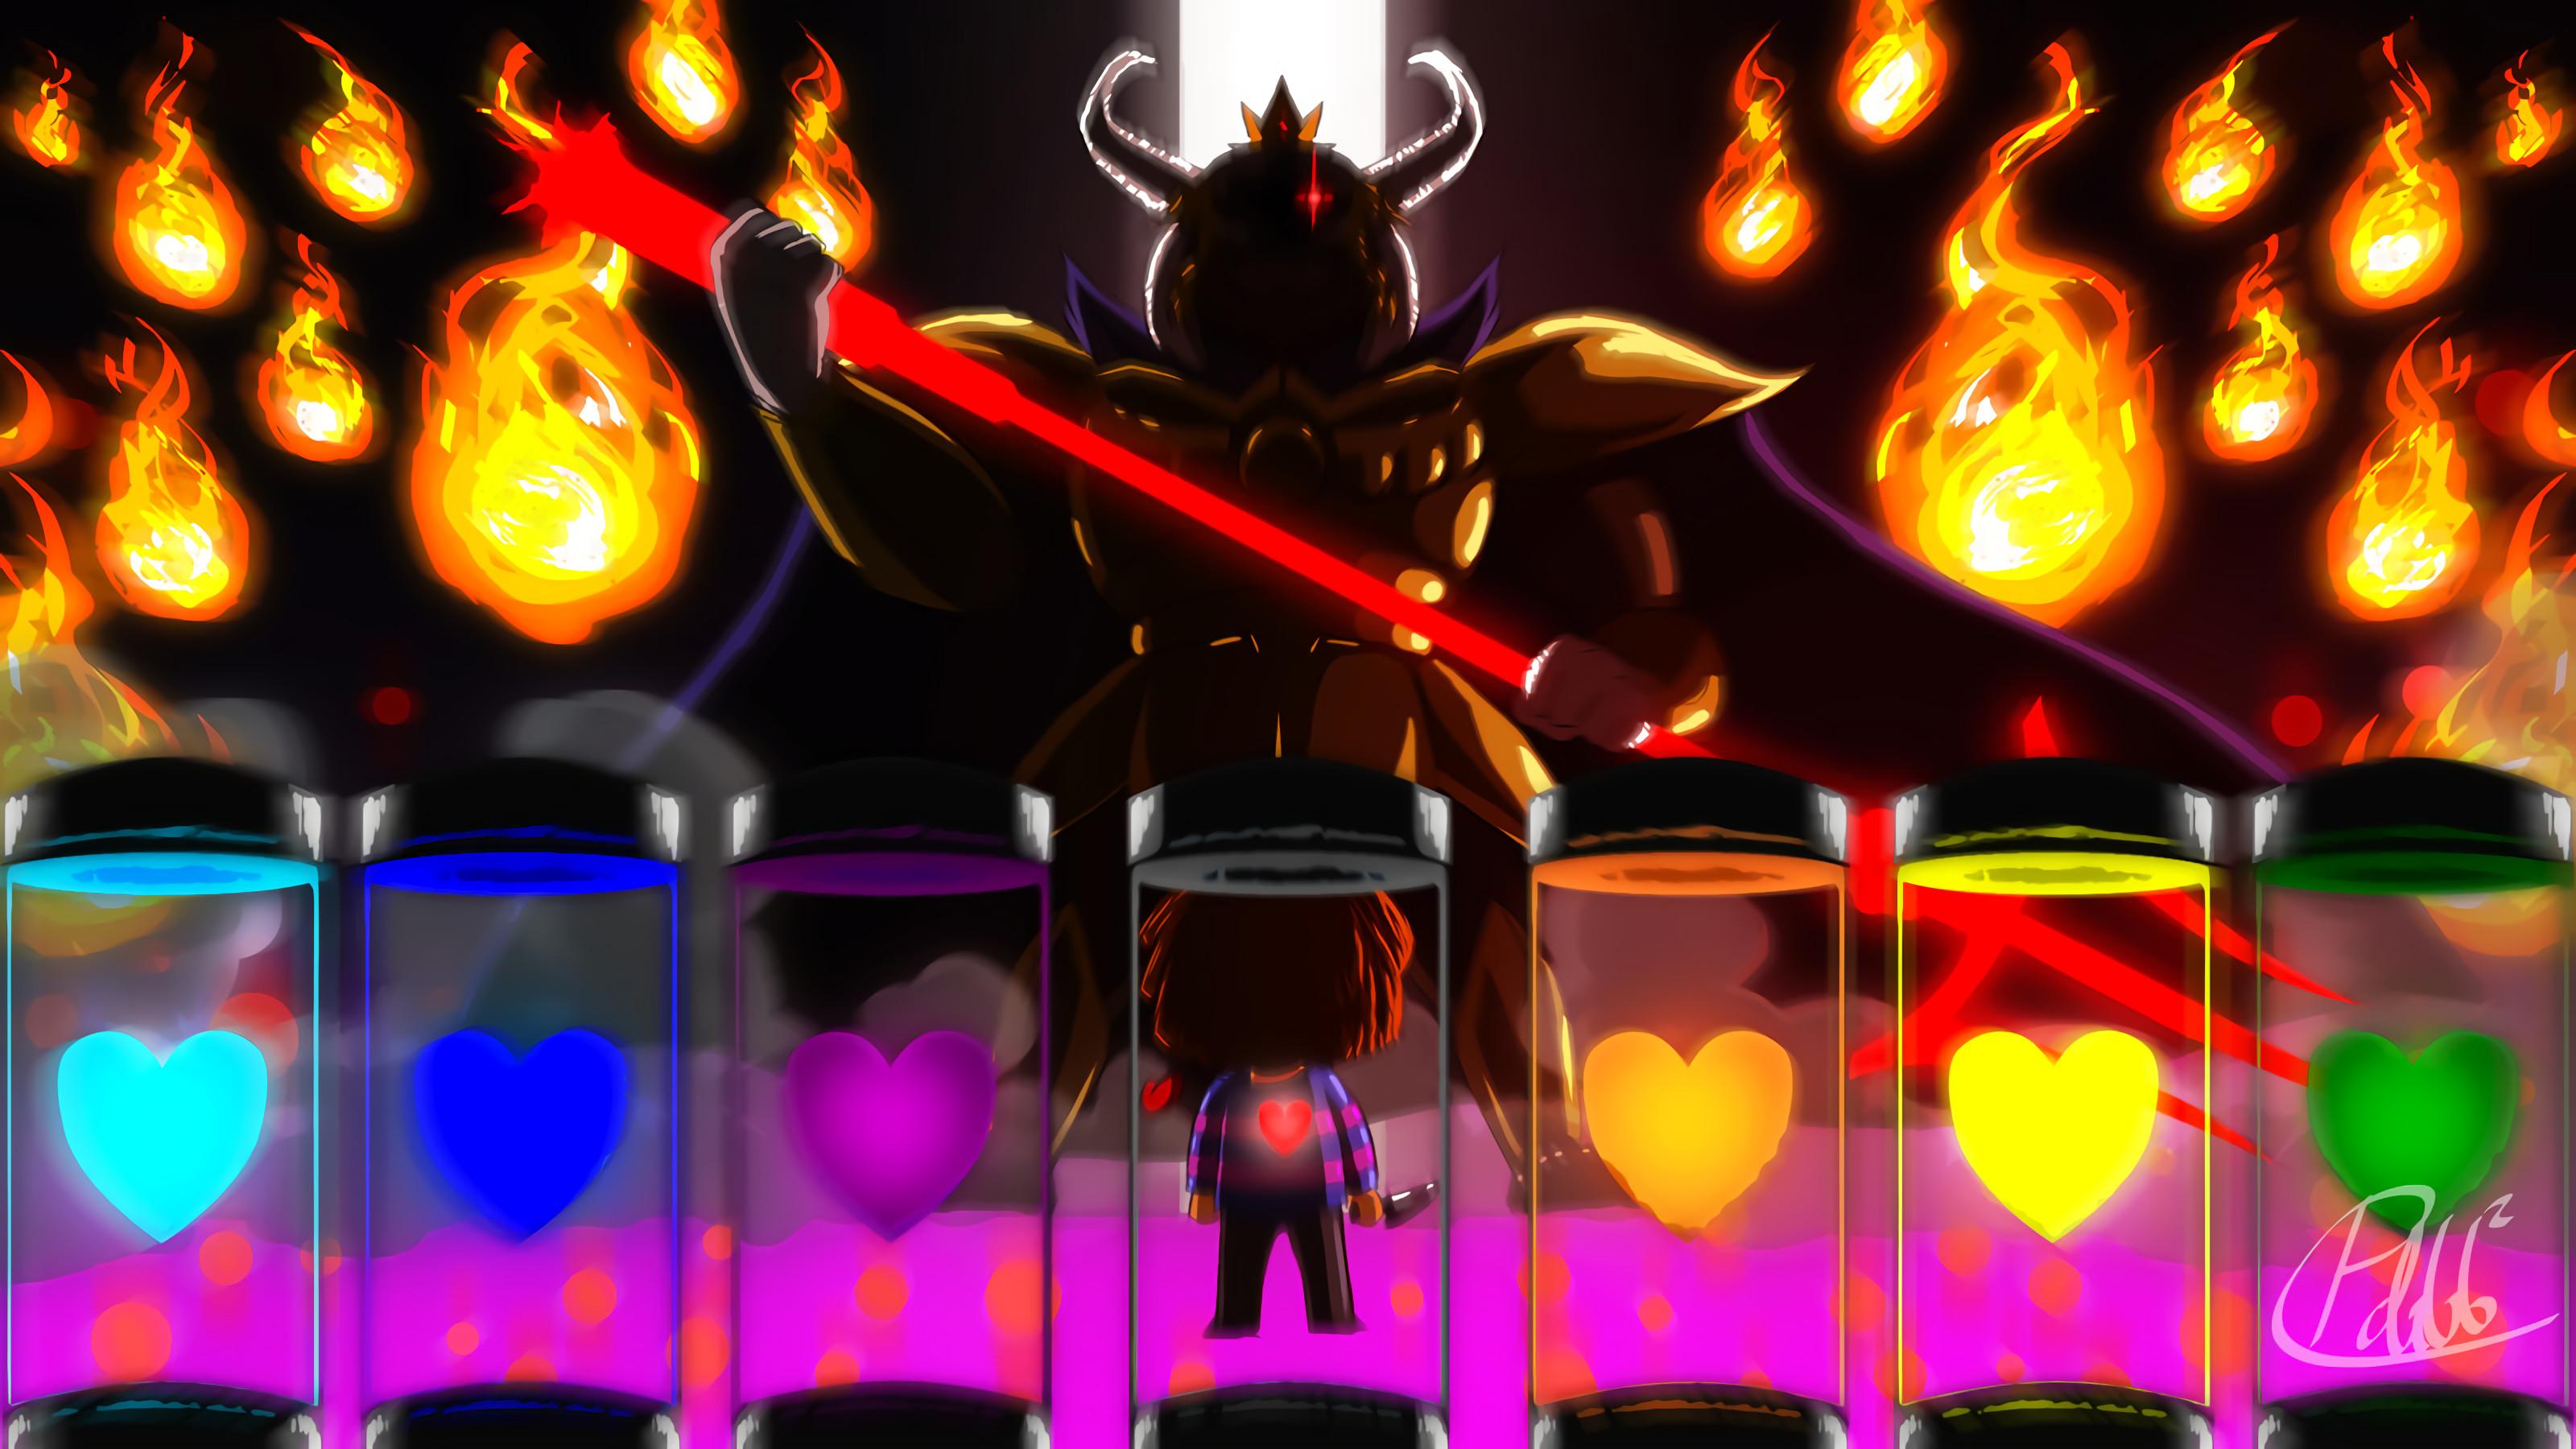 Video Game – Undertale Frisk (Undertale) Asgore (Undertale) Wallpaper